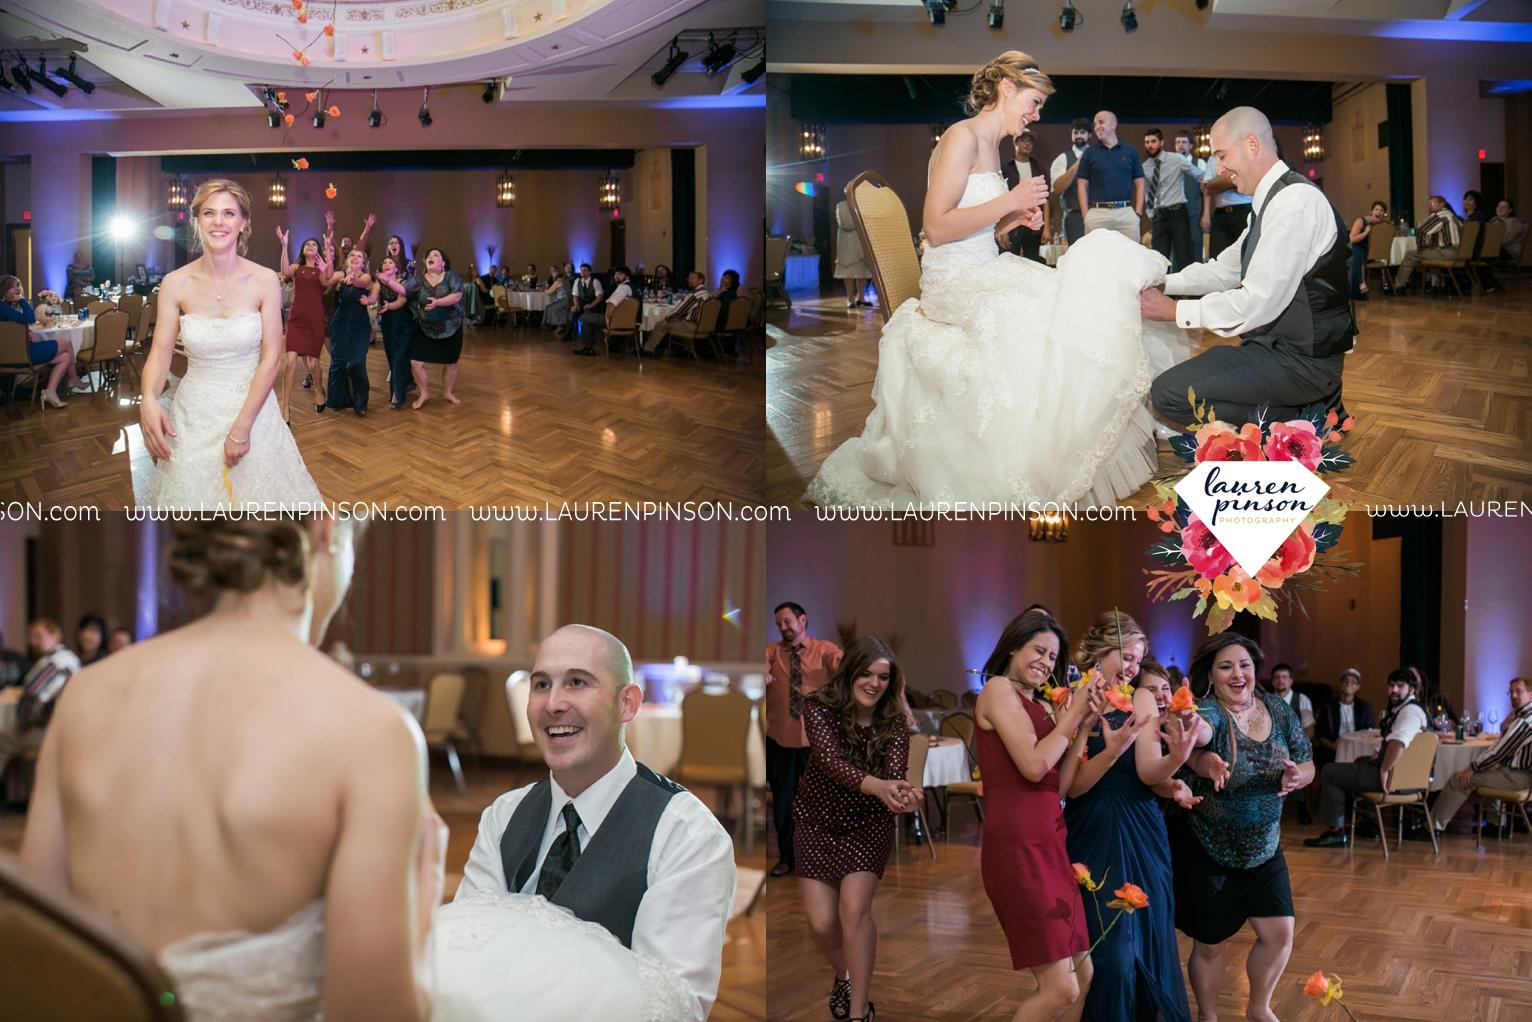 kemp-center-for-the-arts-wichita-falls-texas-wedding-photographer-fall-wedding-pumpkins-193.jpg